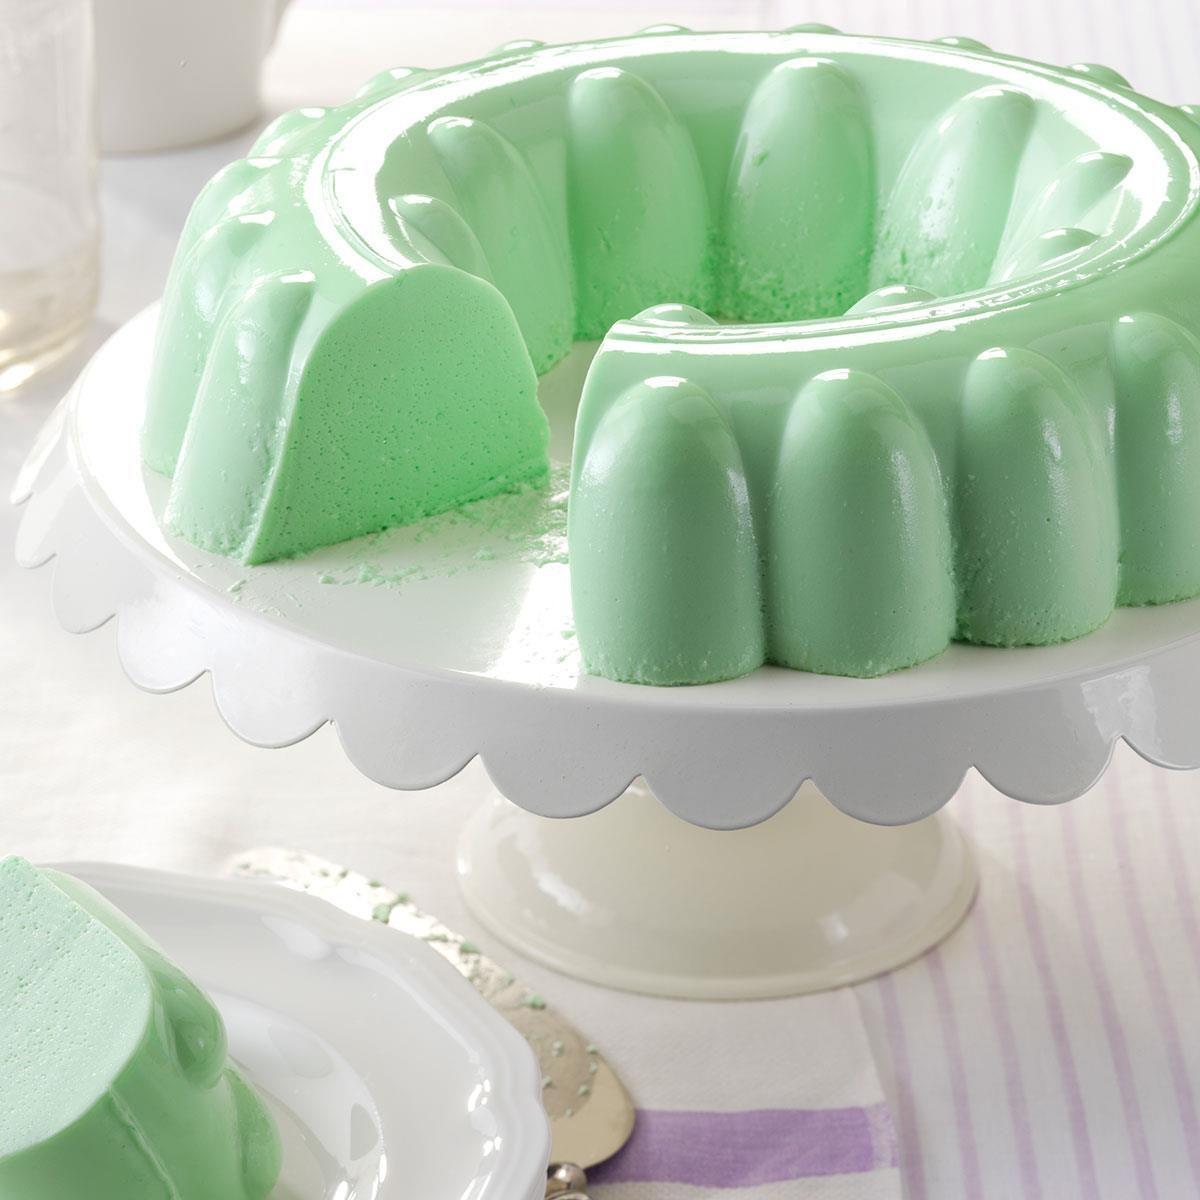 How To Make A Layered Jello Mold Recipe Layered Jello Jello Mold Recipes Jello Molds